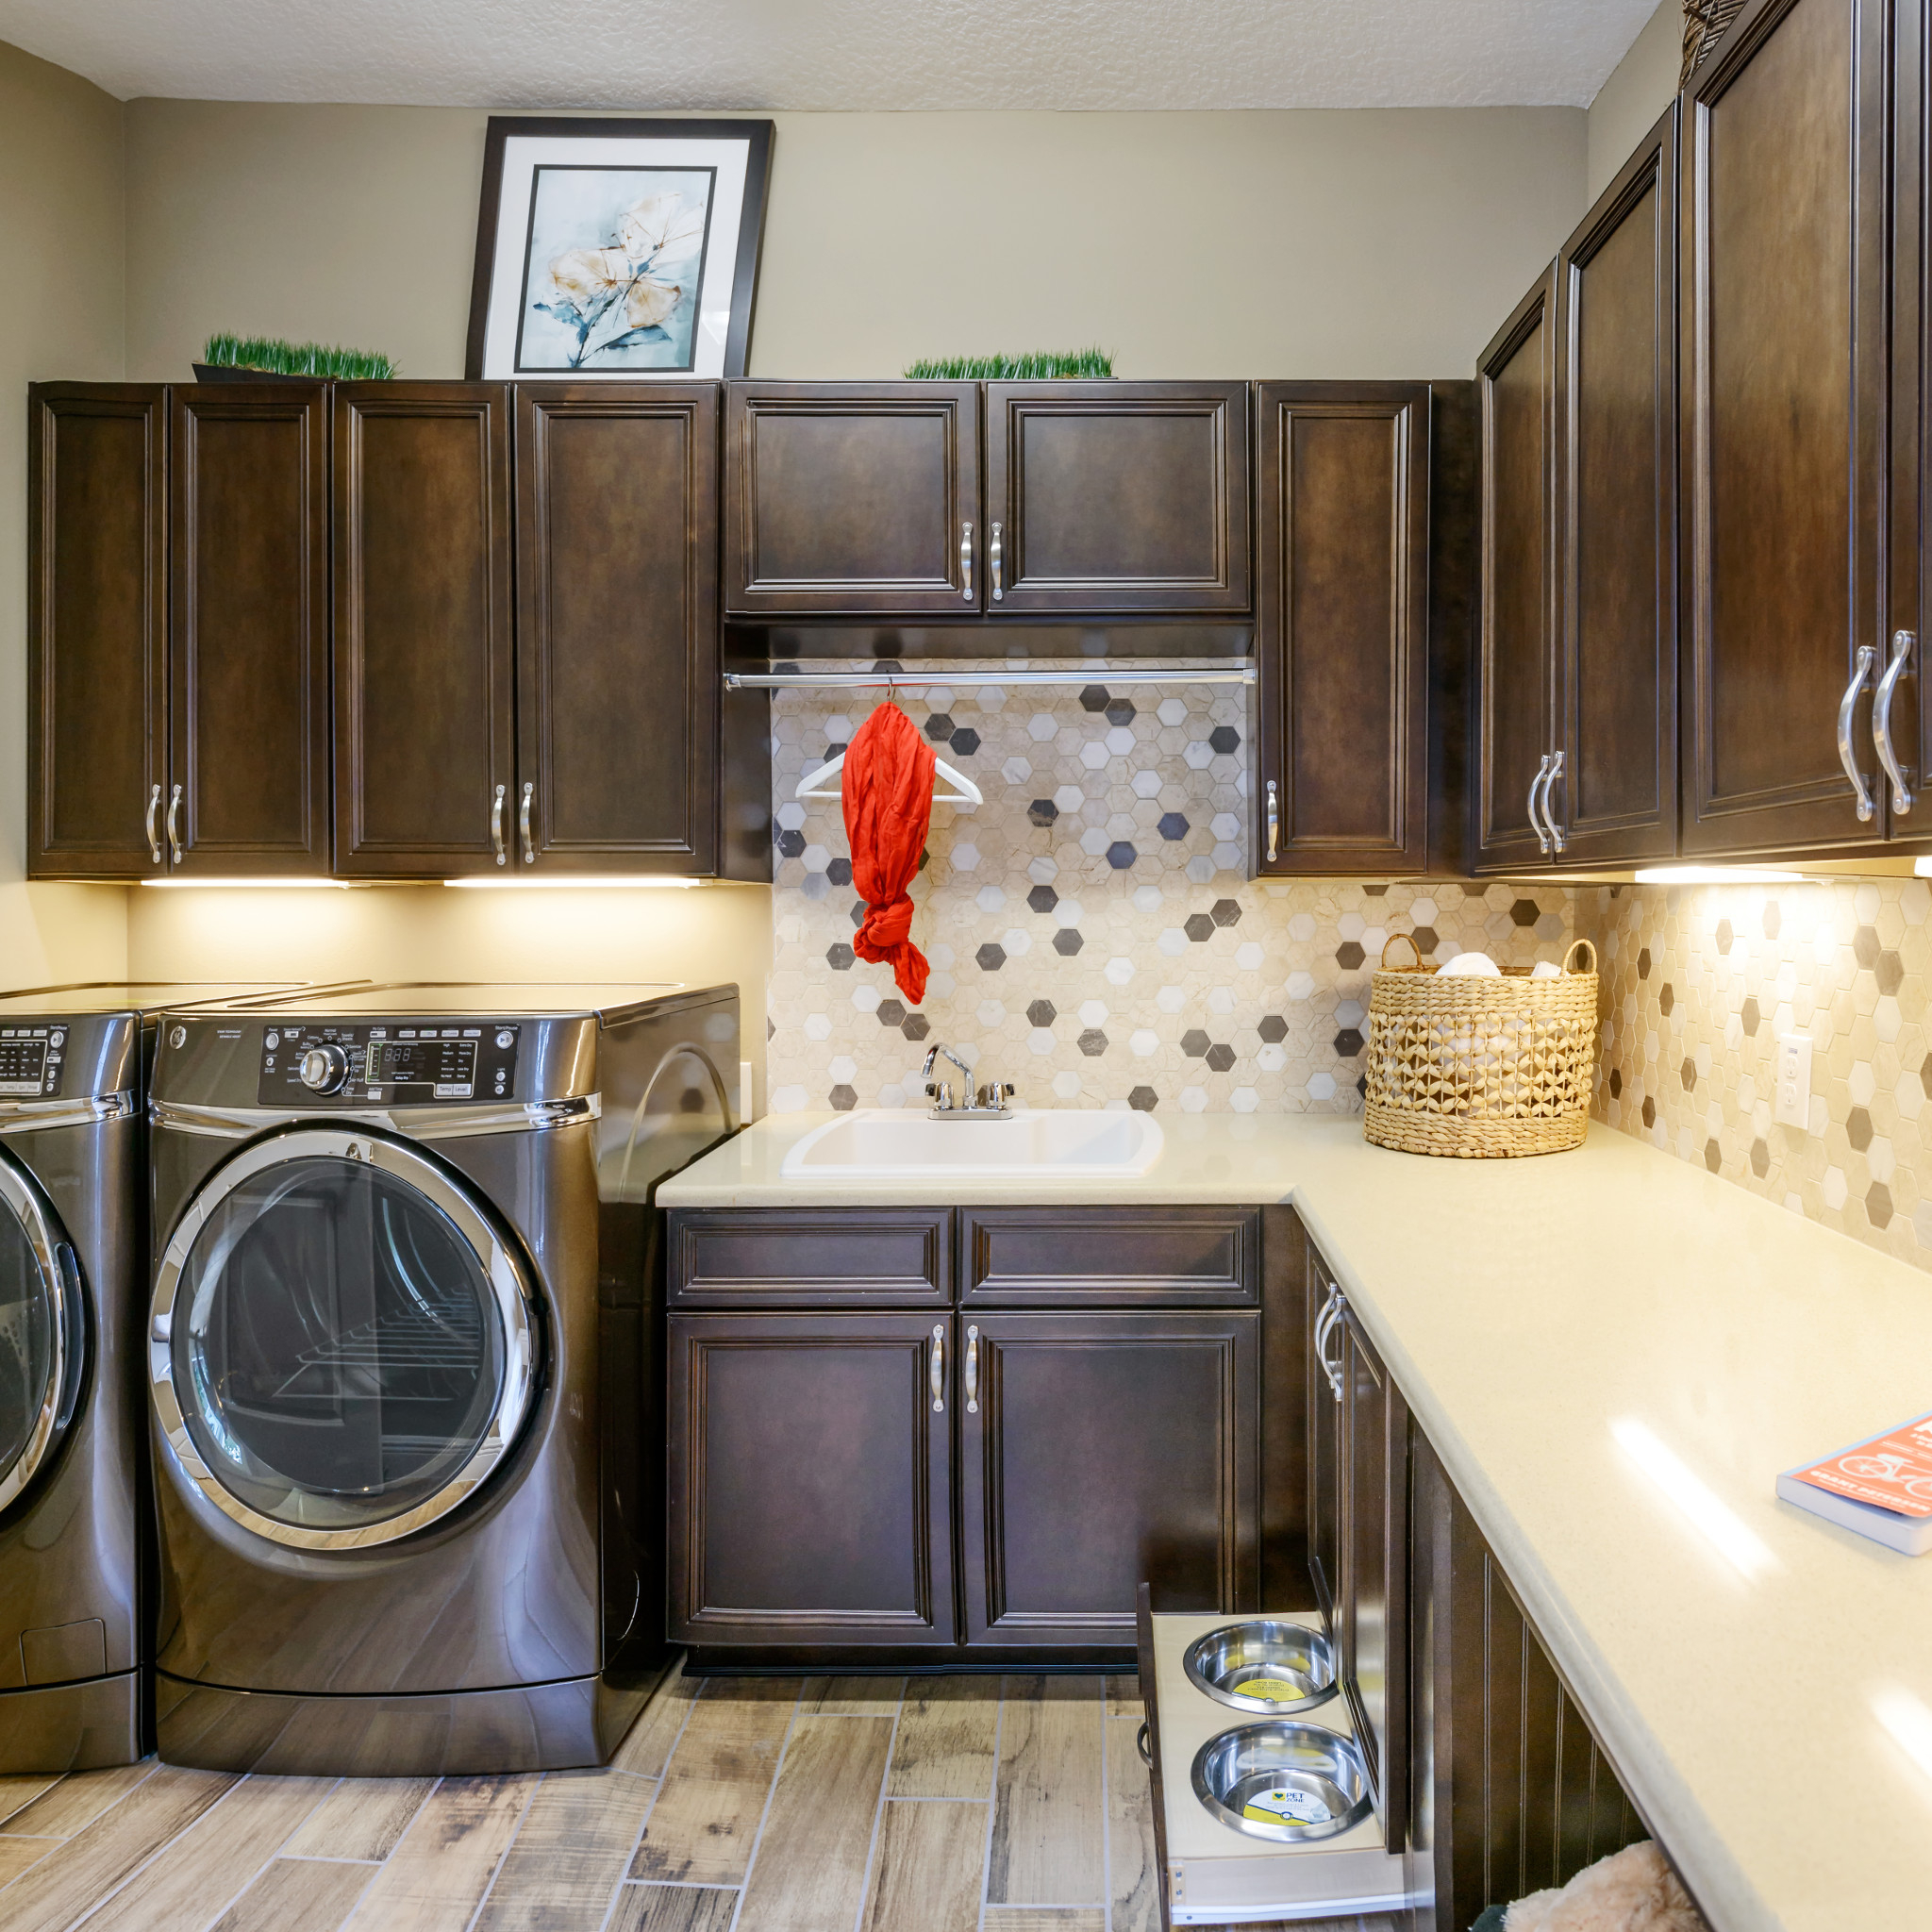 Imagine Plan Laundry Room